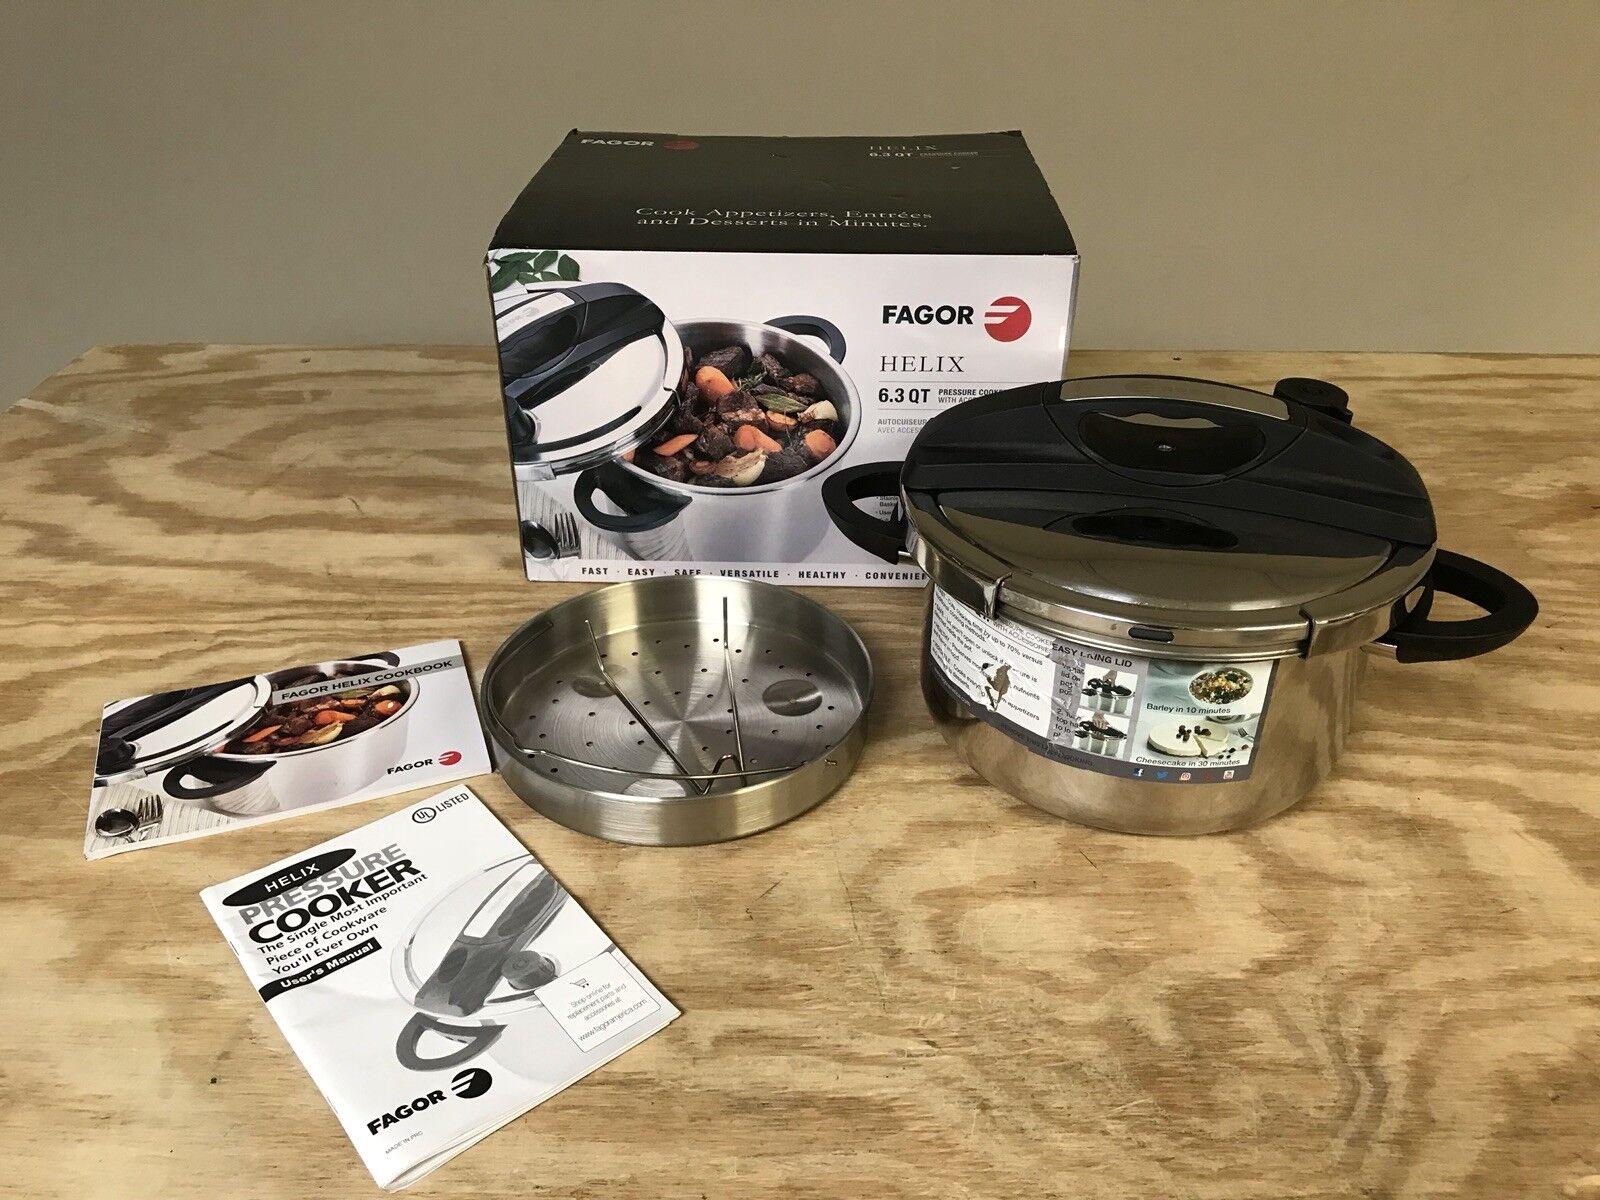 Fagor HELIX 6.3 QT Pressure Cooker w  Steamer Basket and Trivet Pre Owned